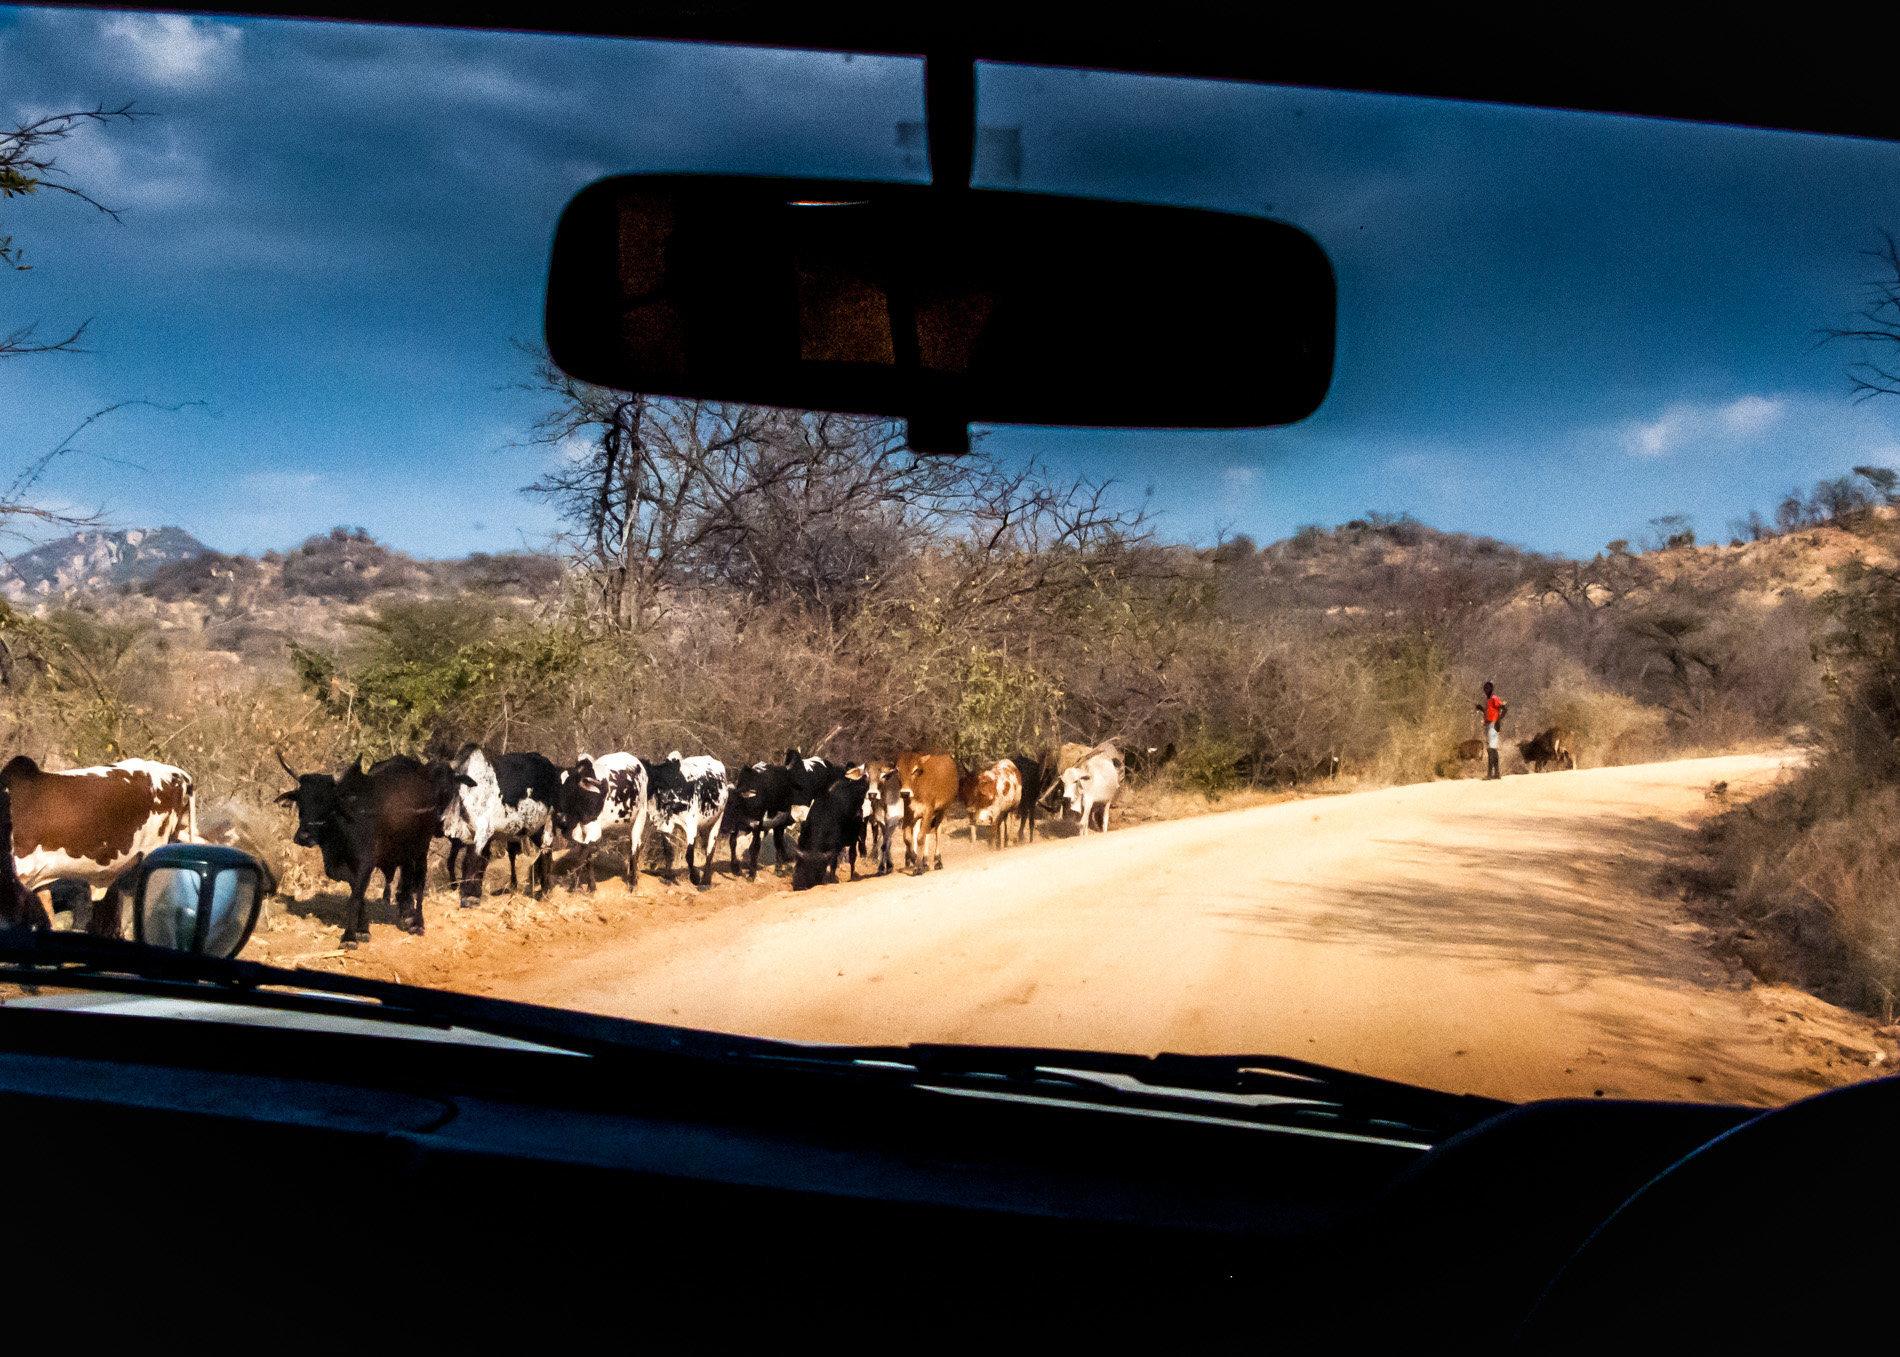 Tanzania,_Back_Seat_View-1707.jpg